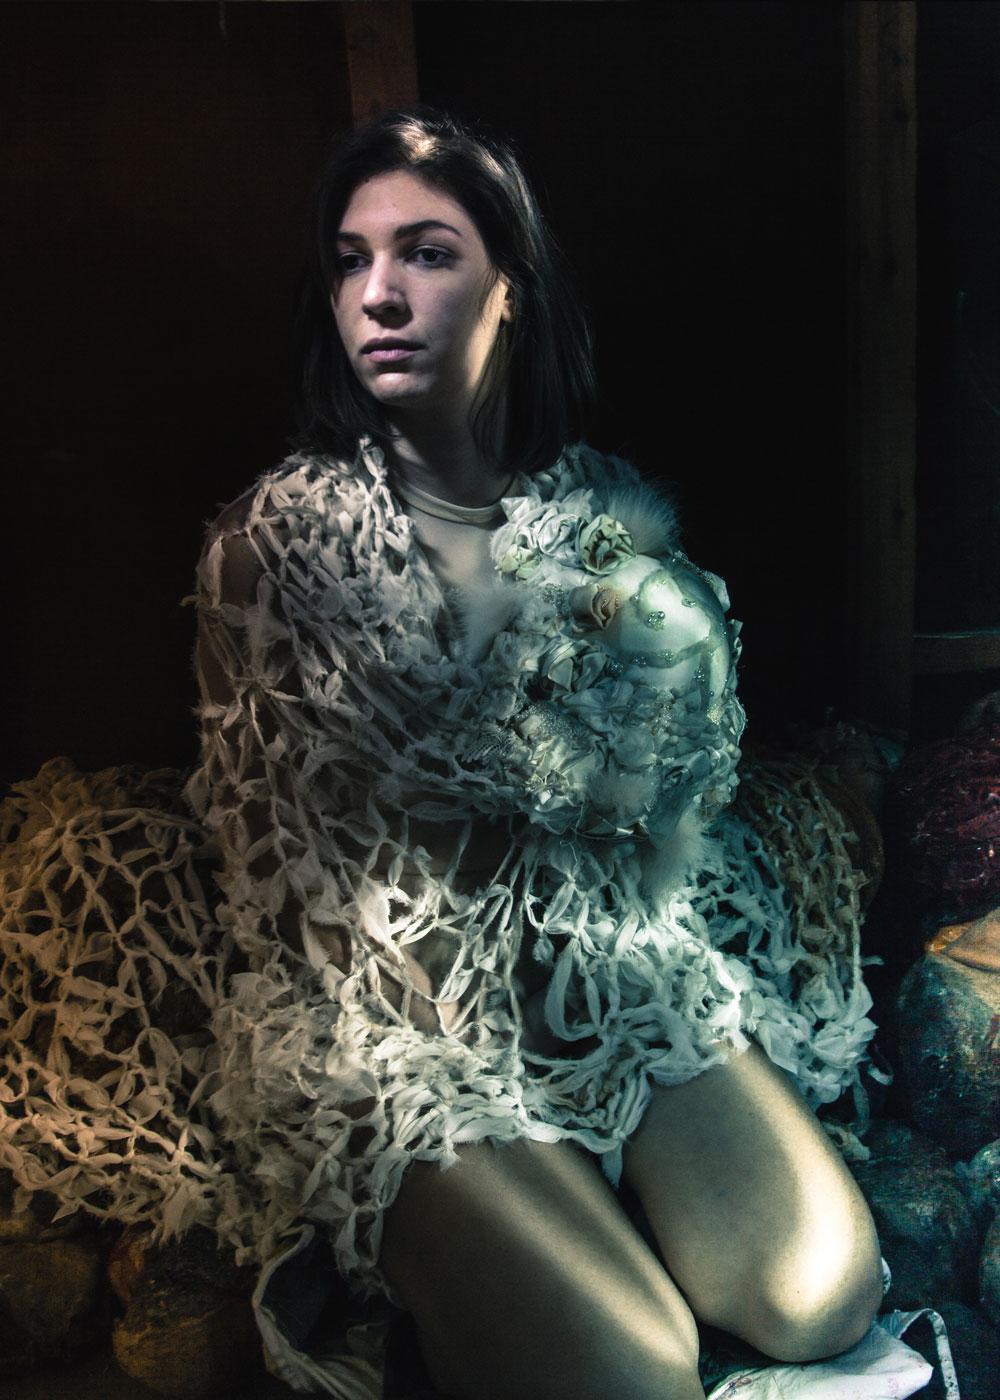 Costume design by Celine Ducret